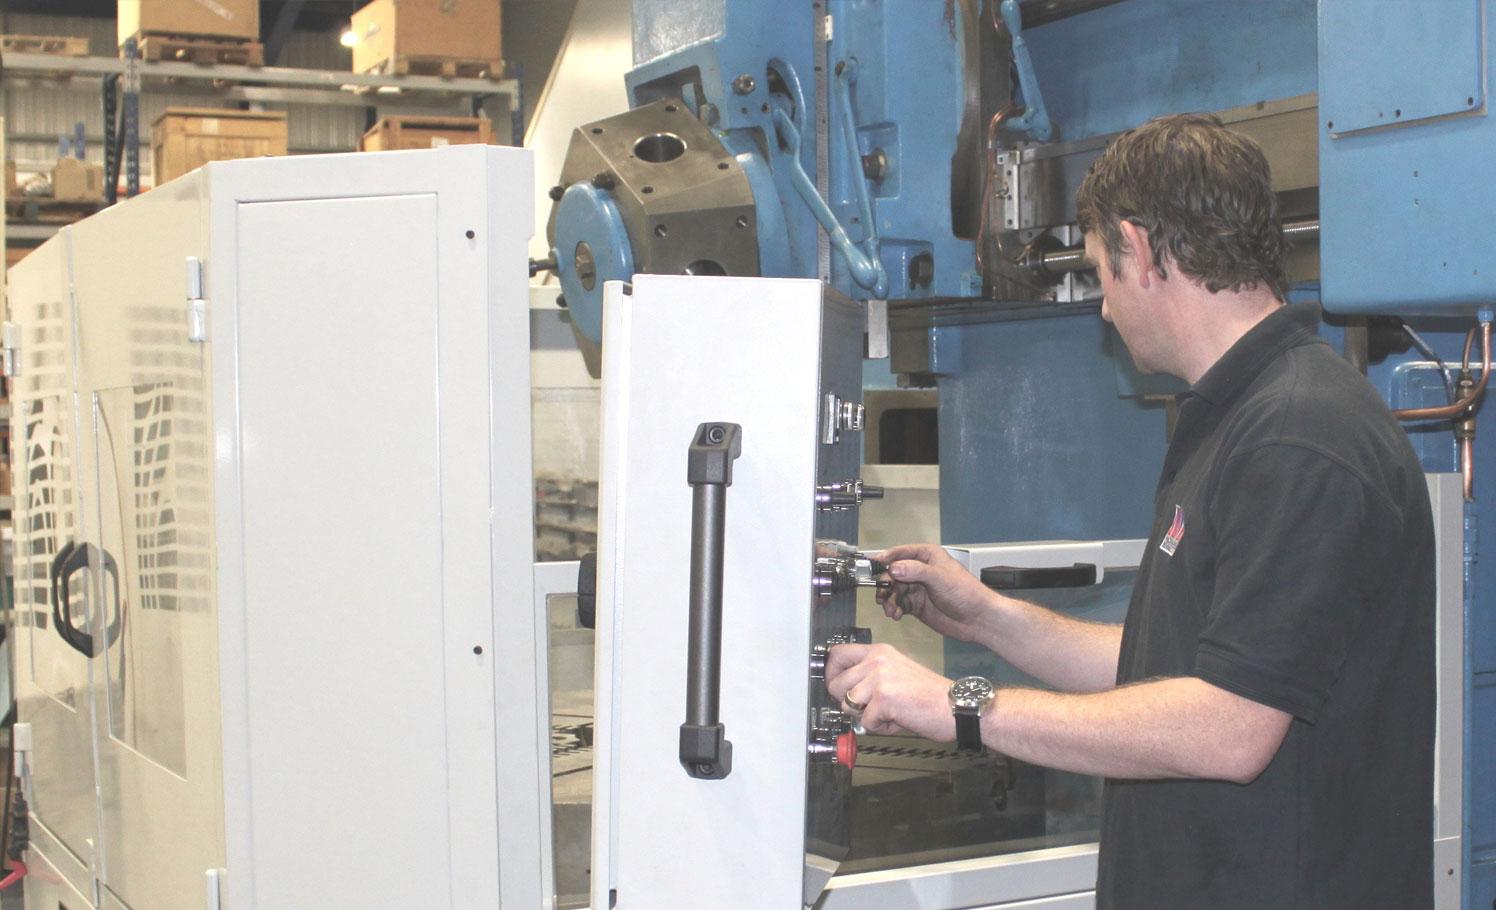 ManuPLus-Cnc-hybrid-manual-machine-upgrades-8